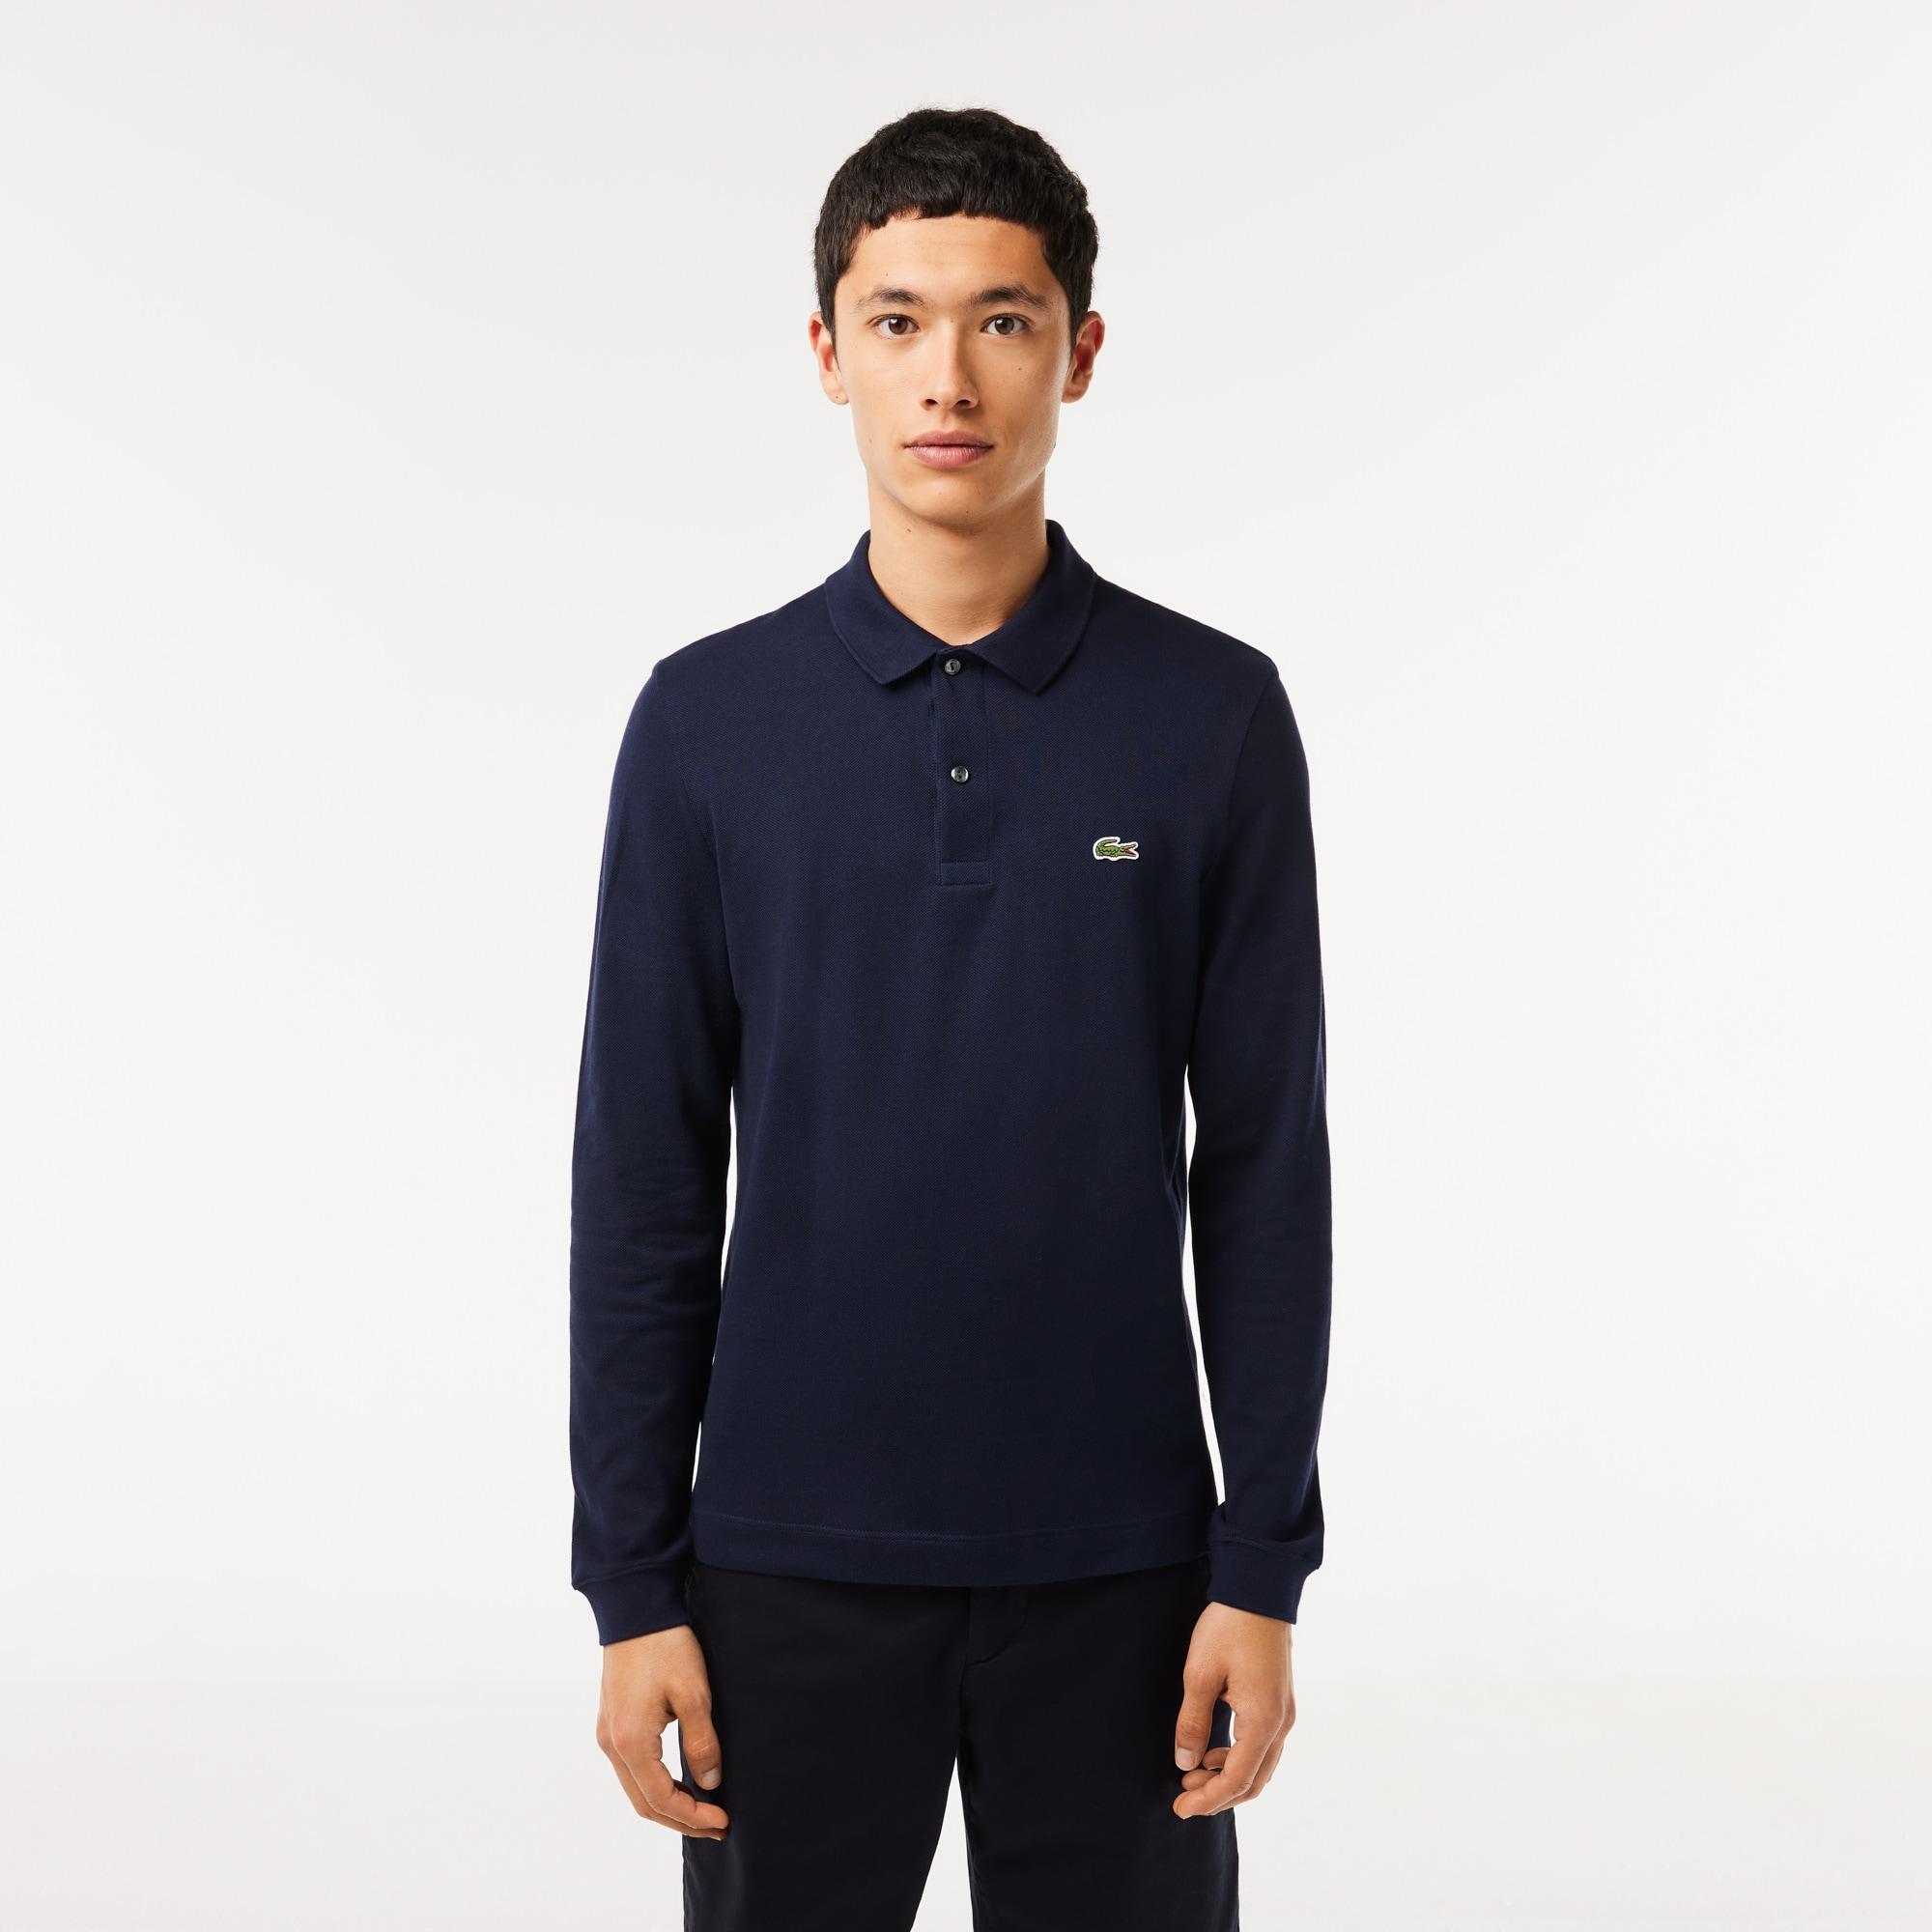 LACOSTE Slim Fit Herren-Poloshirt aus Petit Piqué